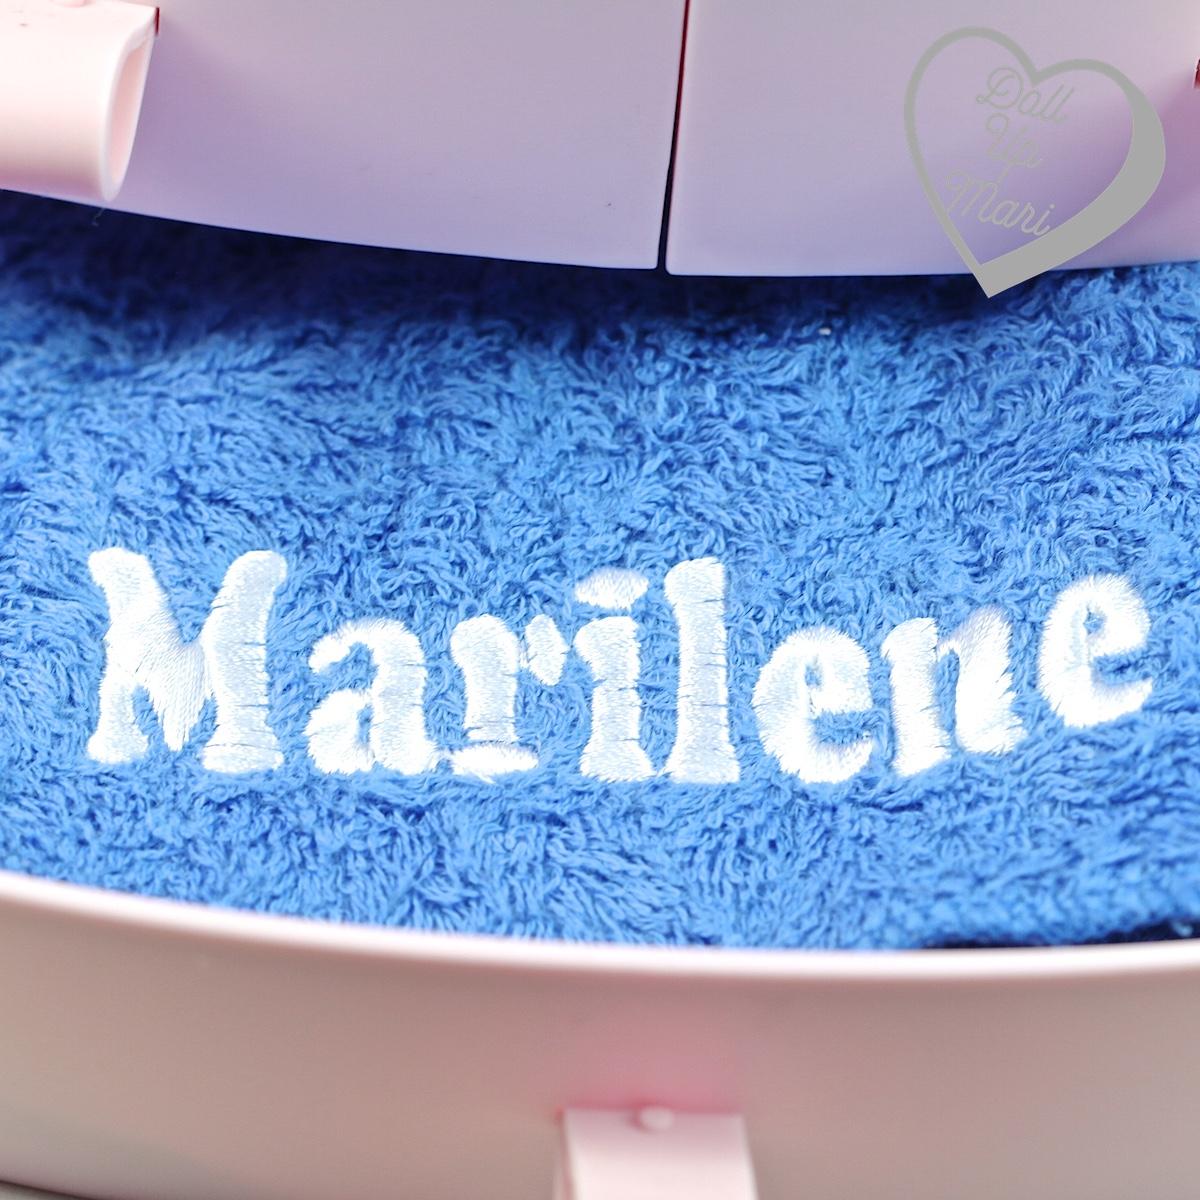 personalized Marilene towel